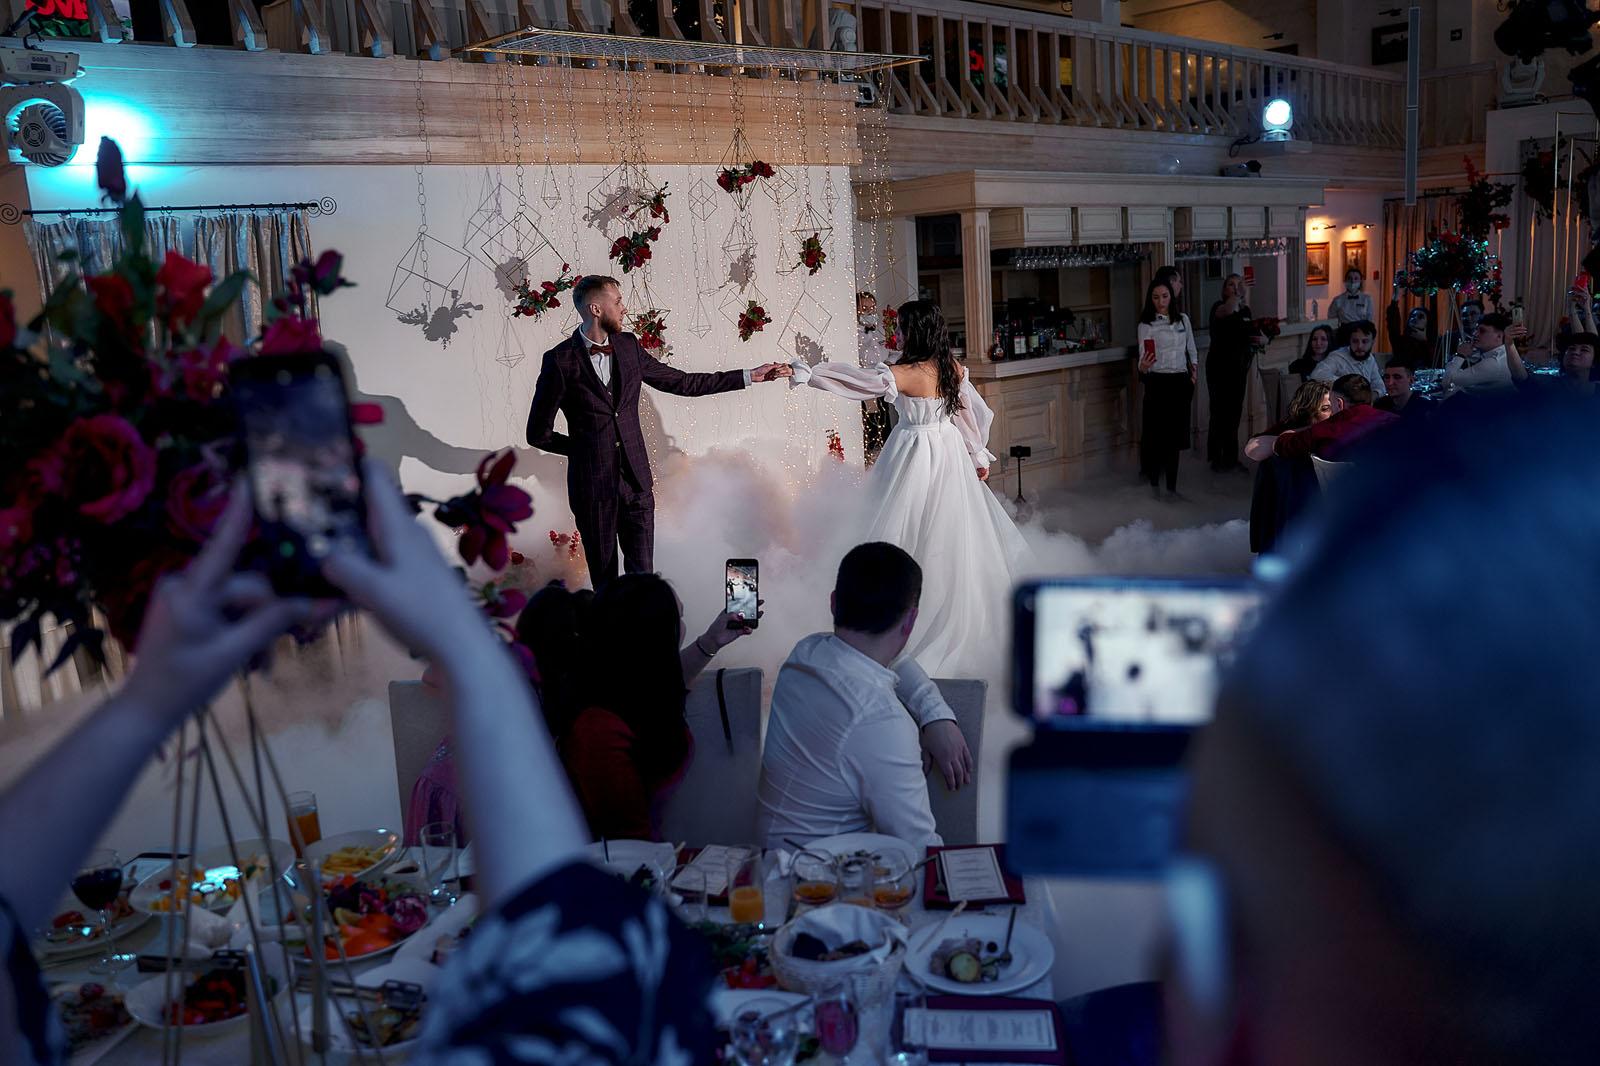 wedding@bekarev2021-04-10-18-15-49.jpg